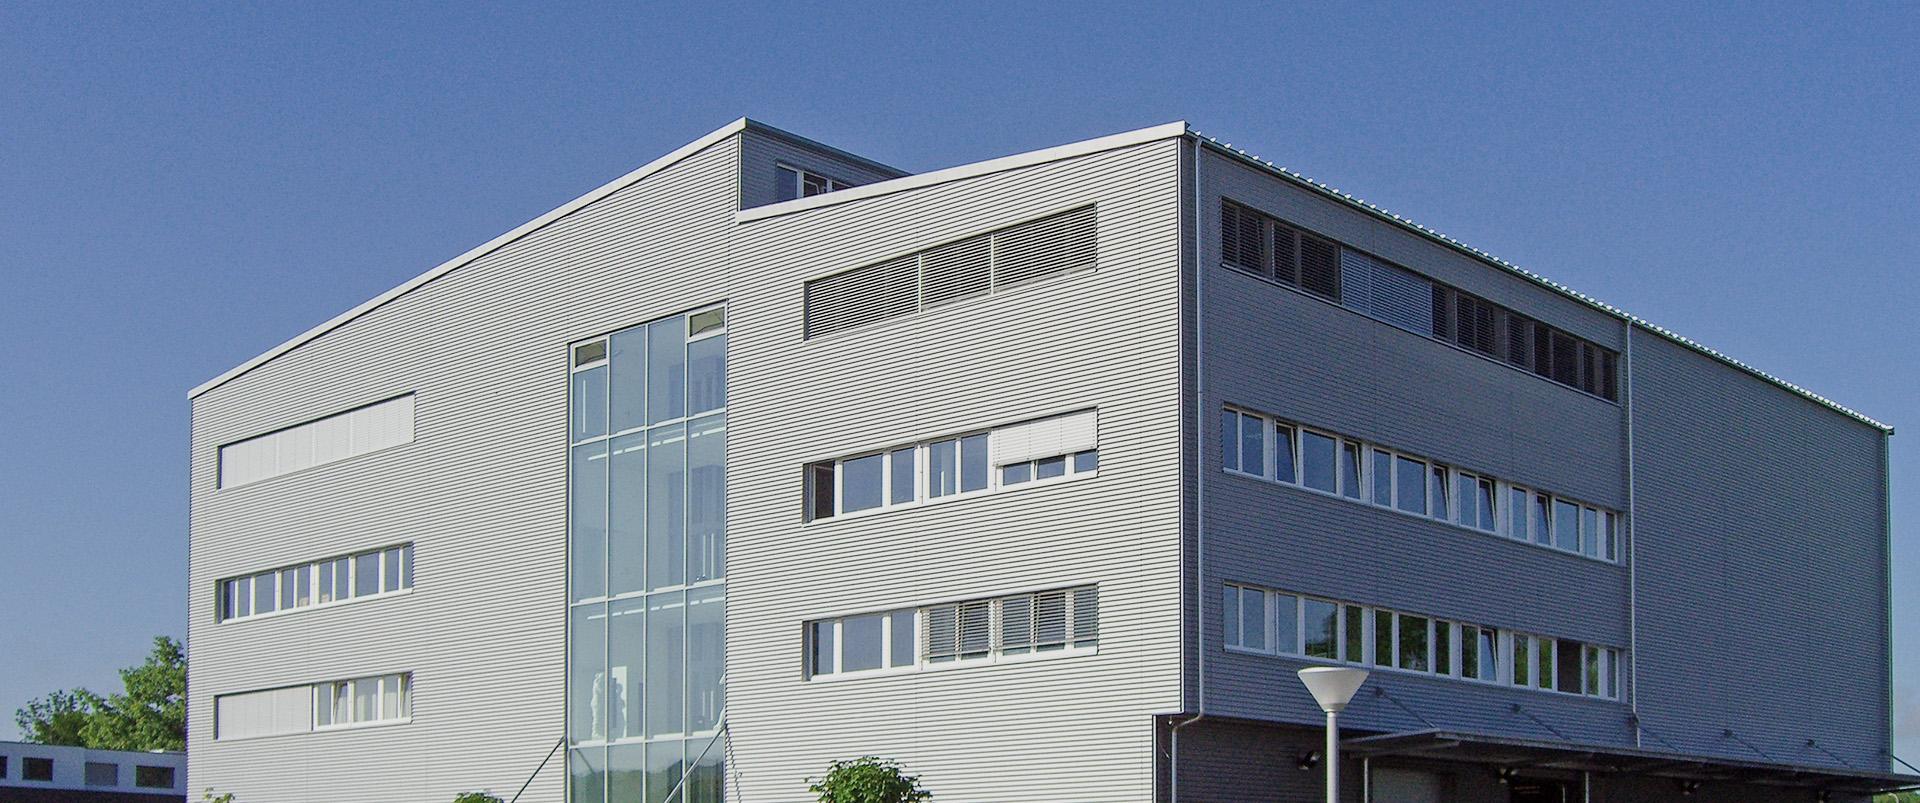 Maxxpark Gewerbe